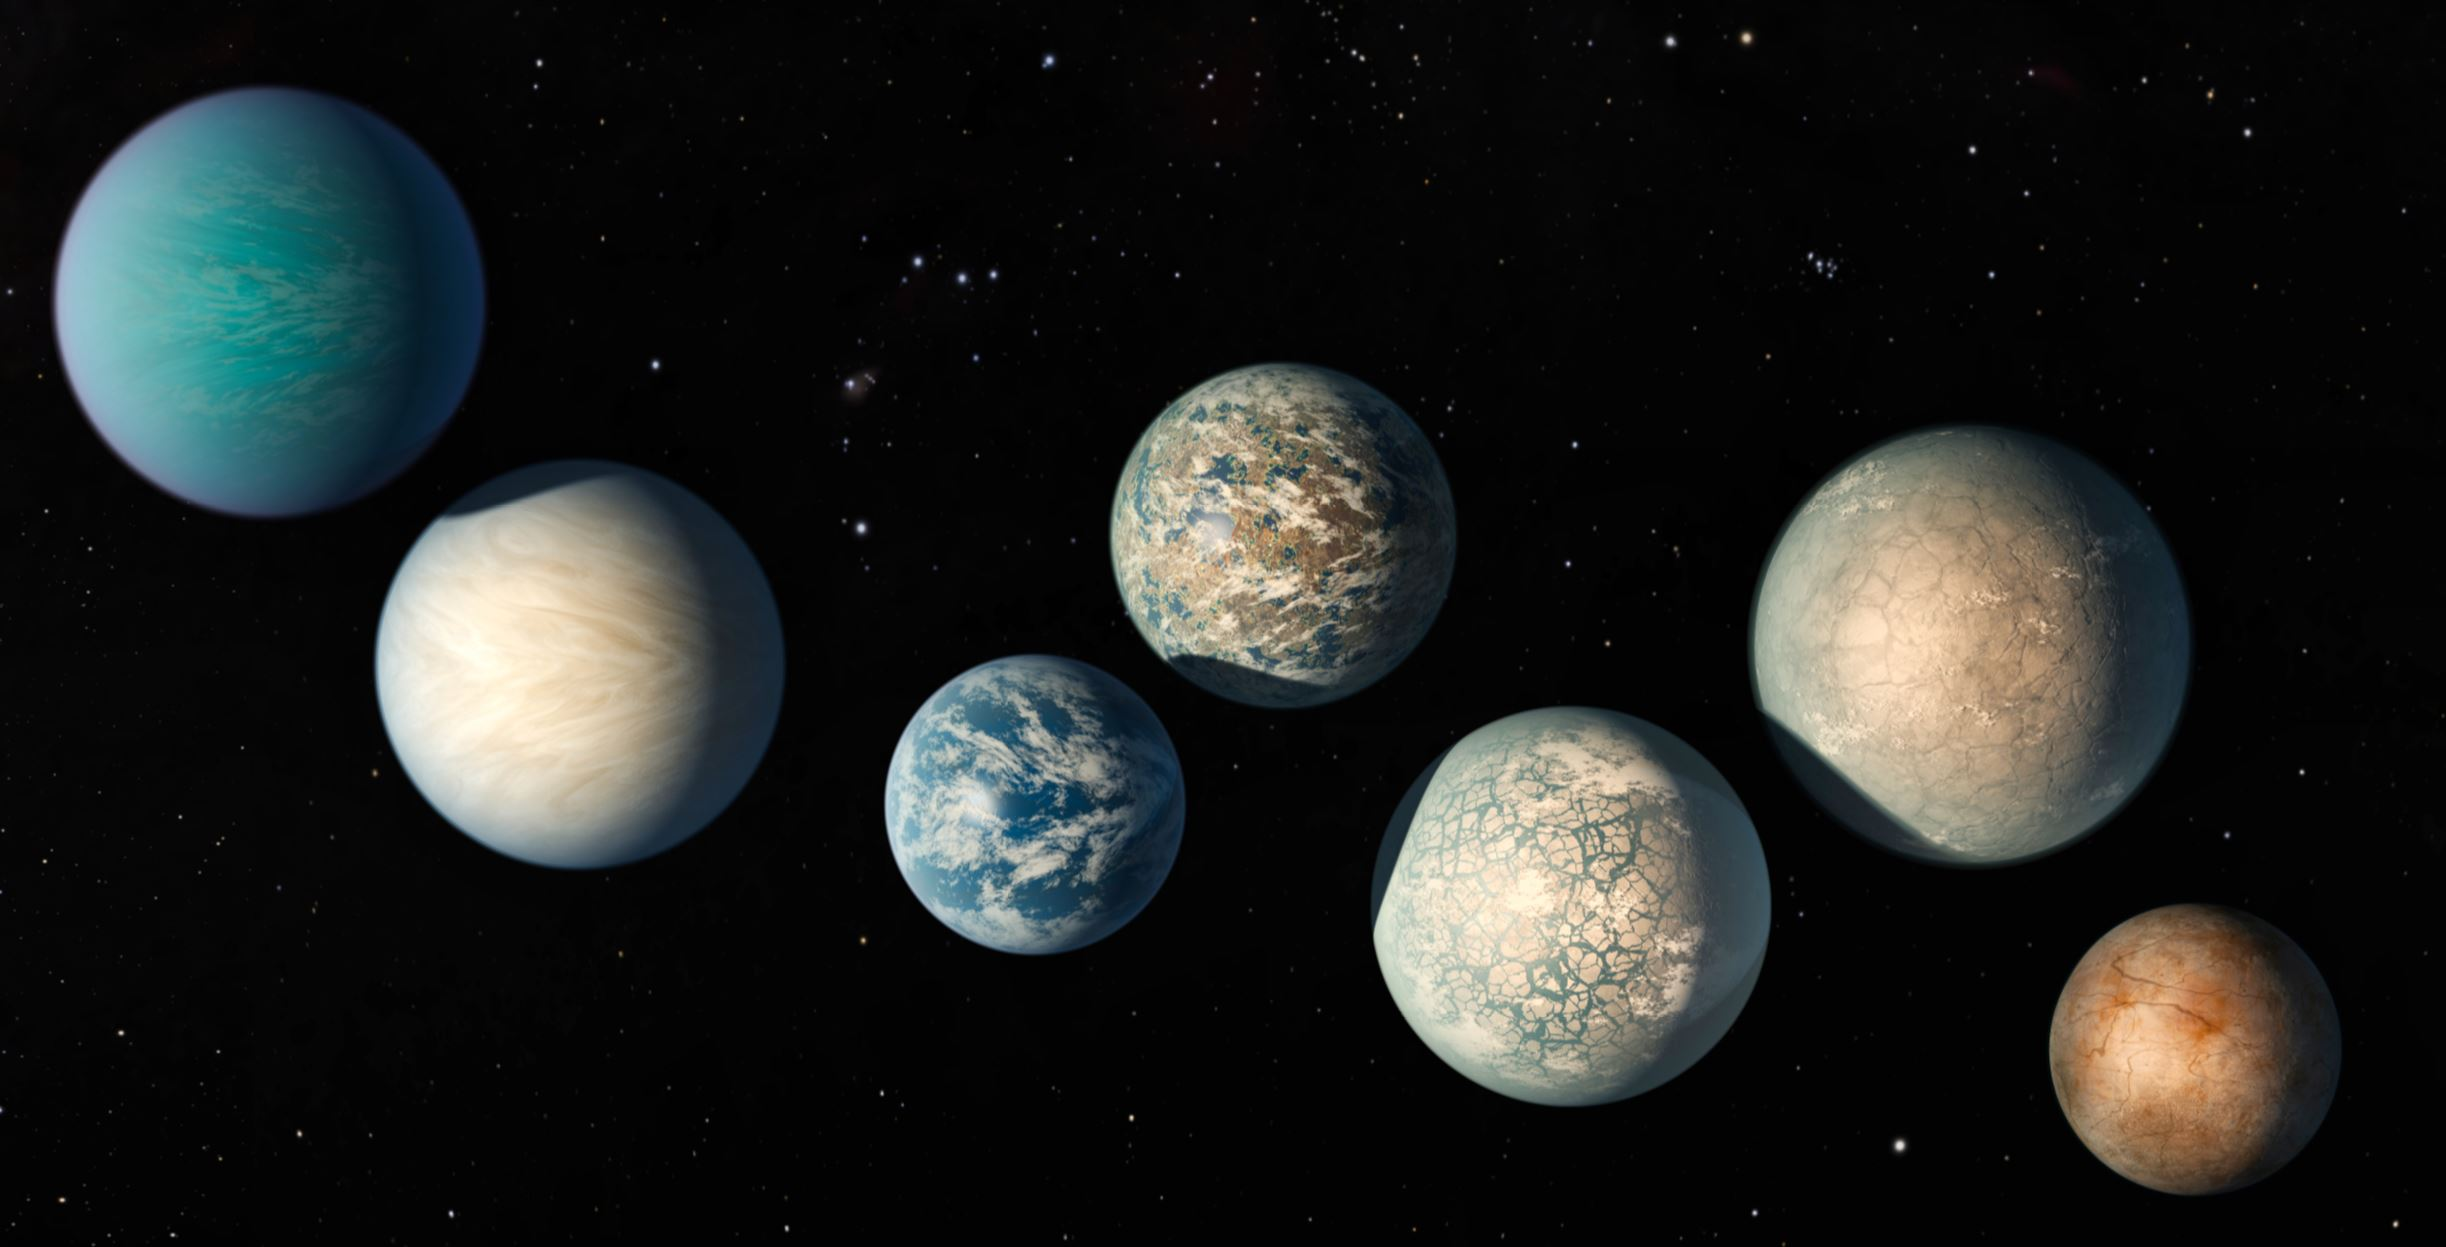 nasa planetary scientists - HD1820×1024